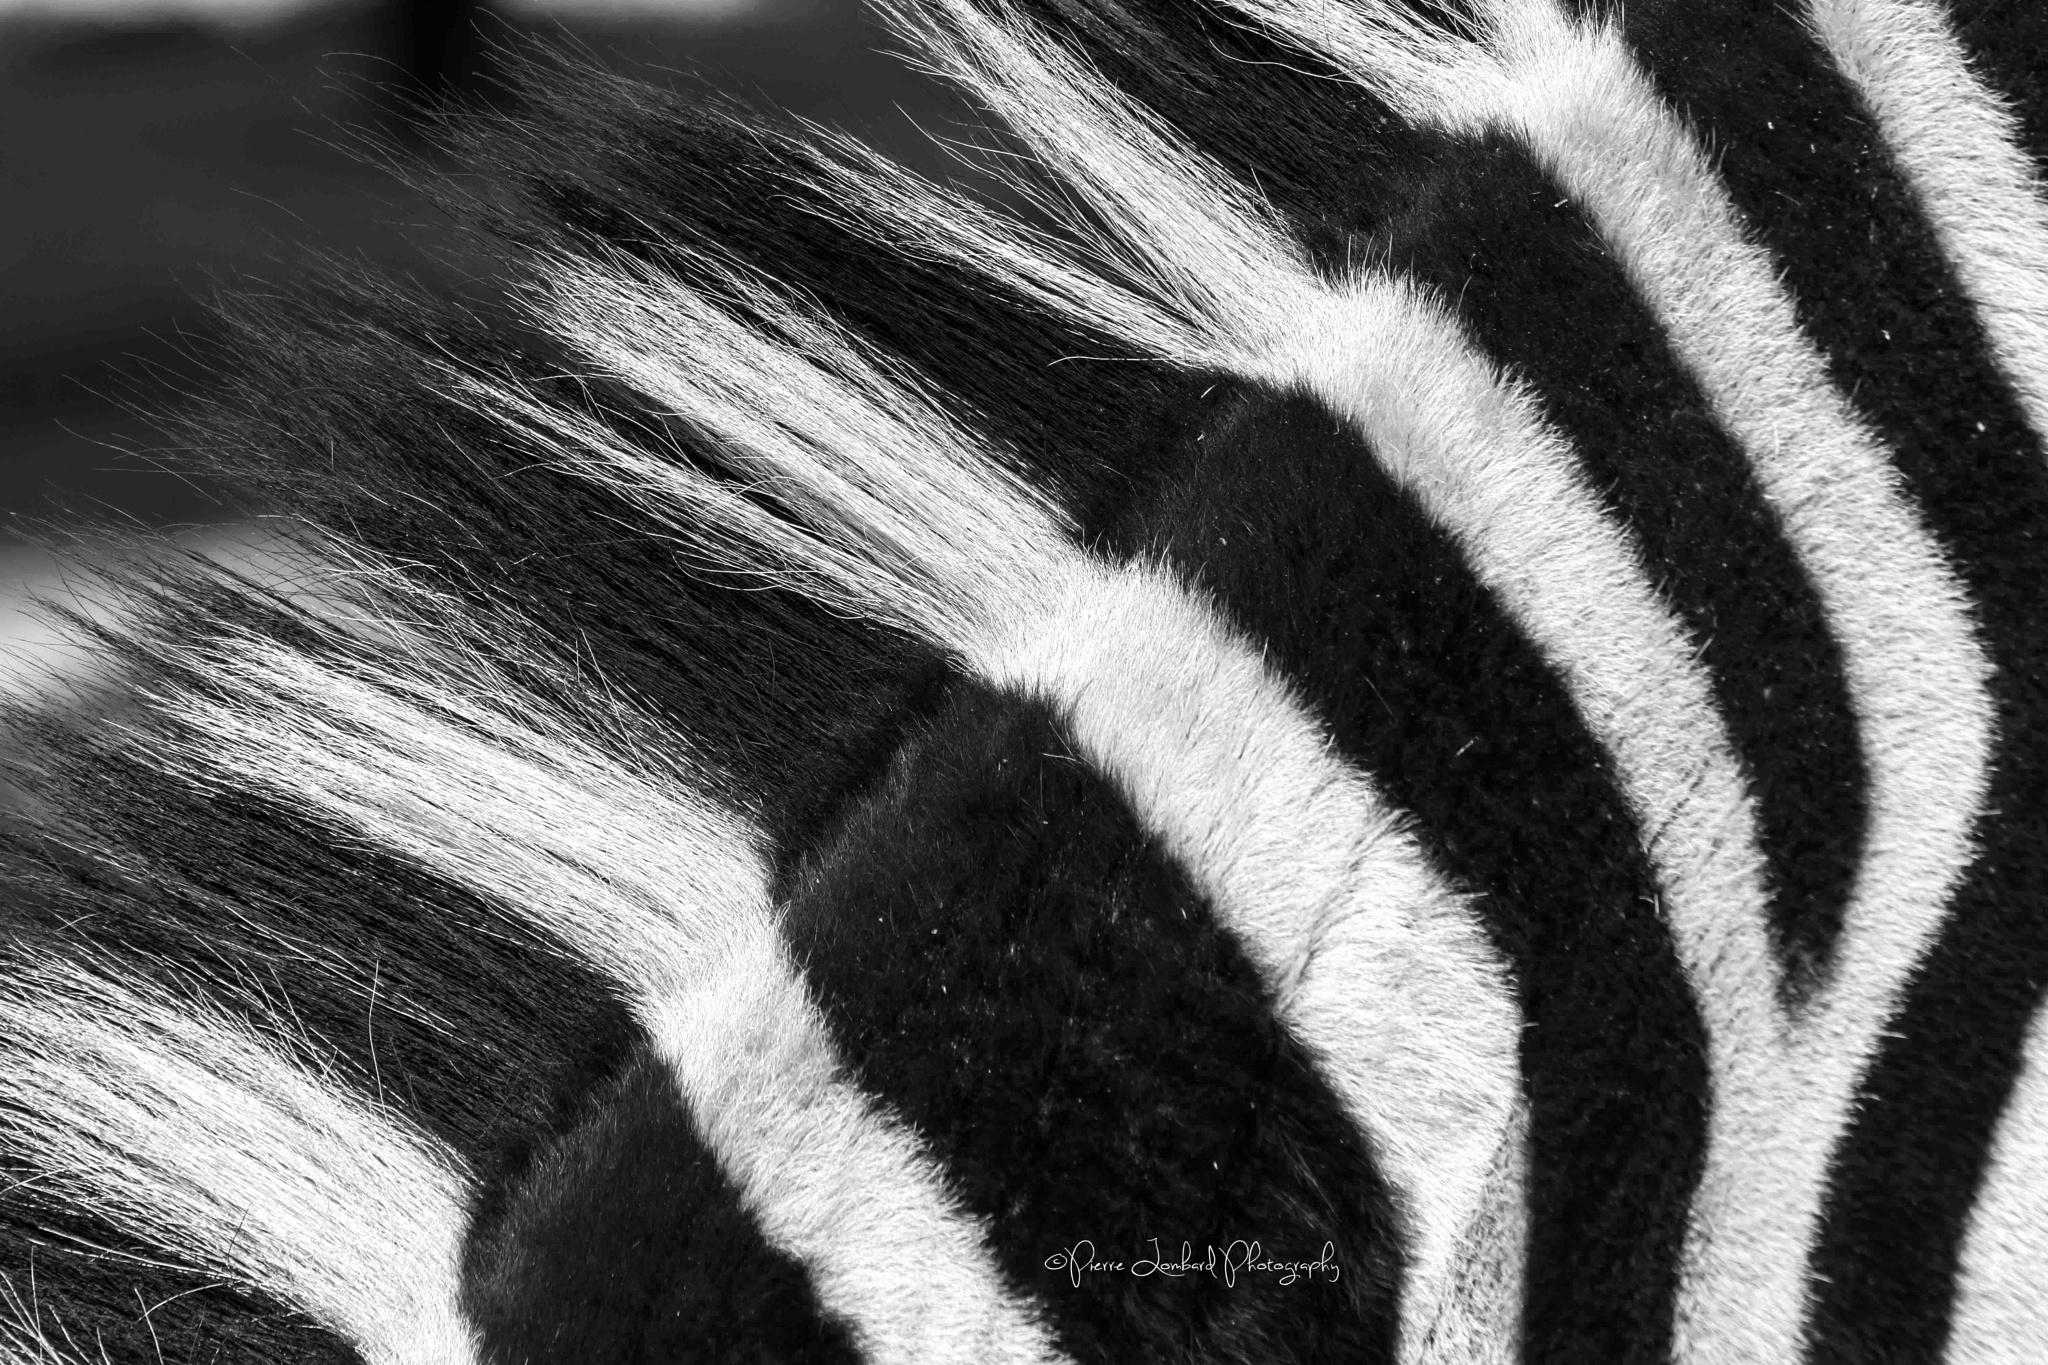 Stripes by Pierre Lombard